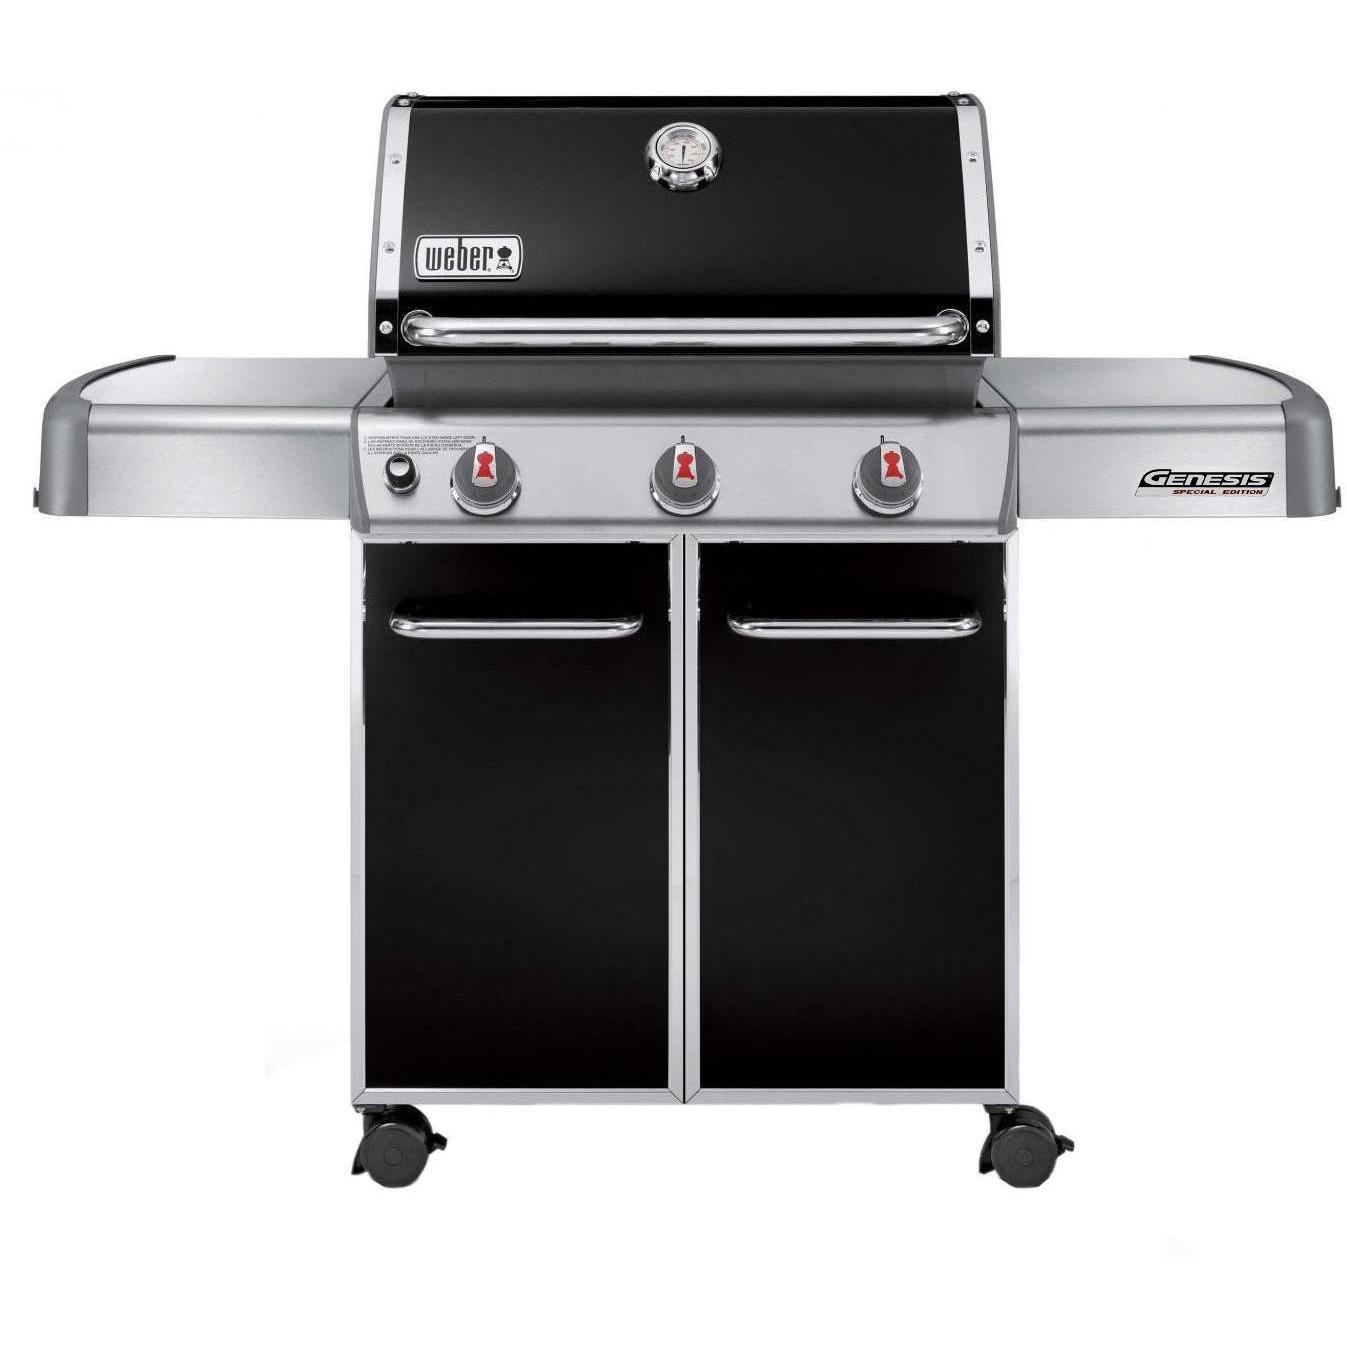 Weber Genesis Premium EP-310 Natural Gas Grill On Cart - Black 2894760